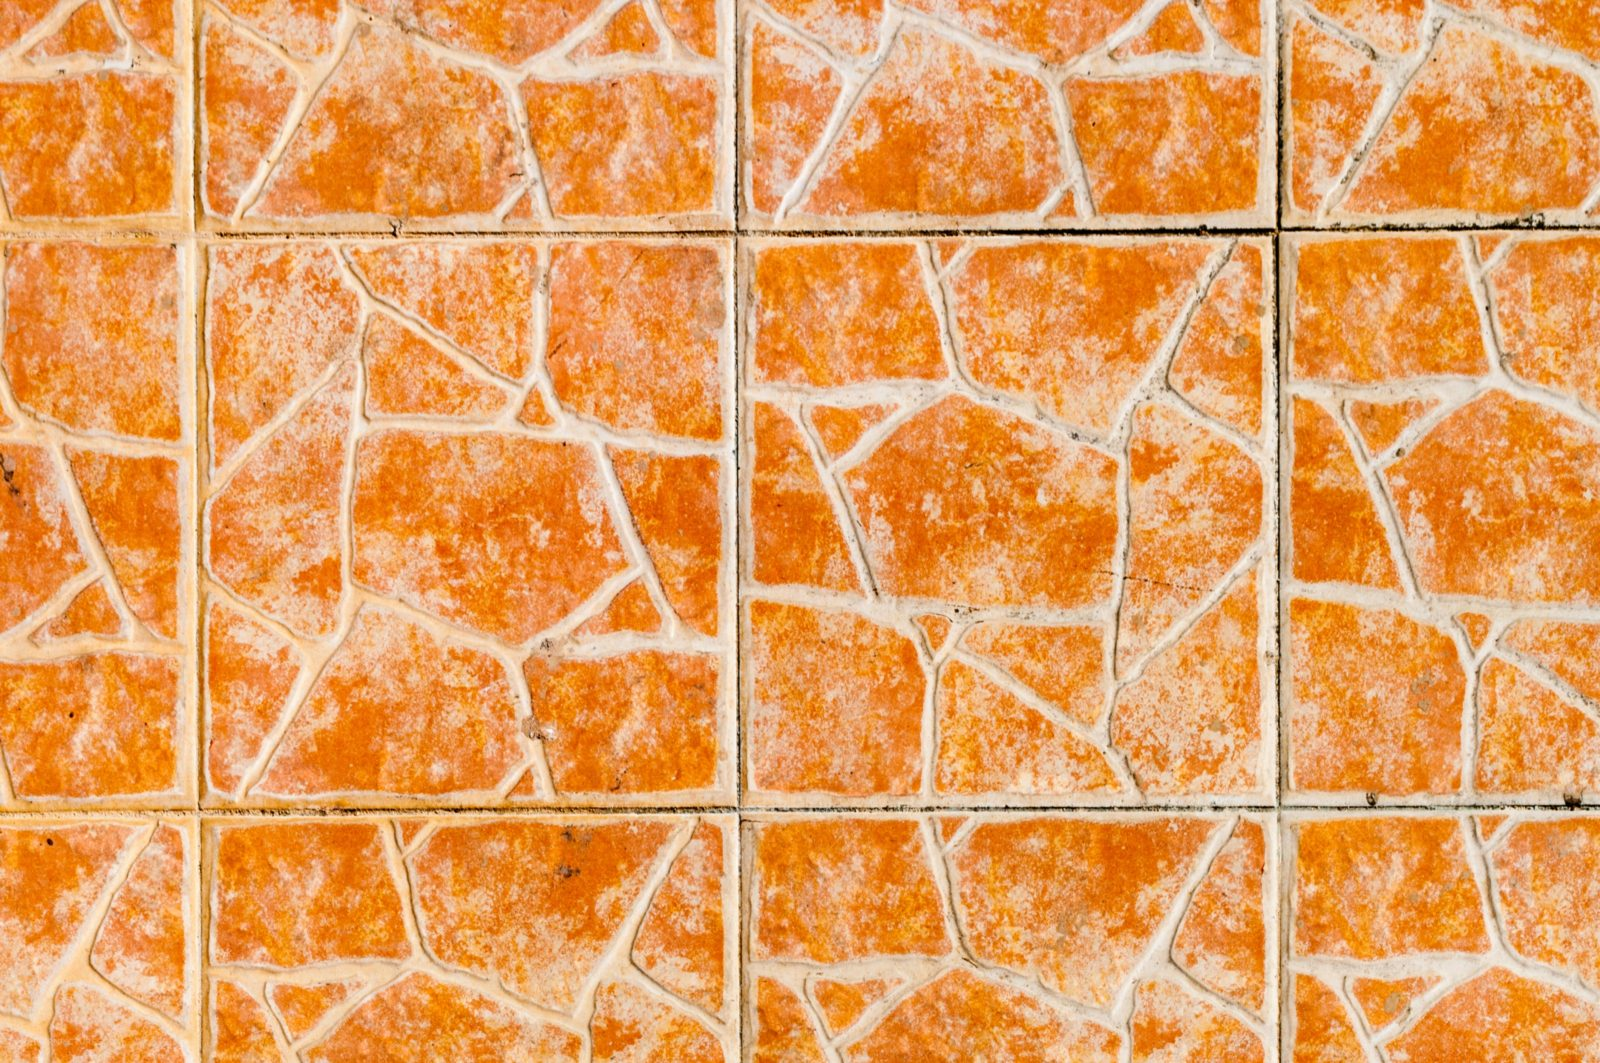 Orange cracked pattern tiles